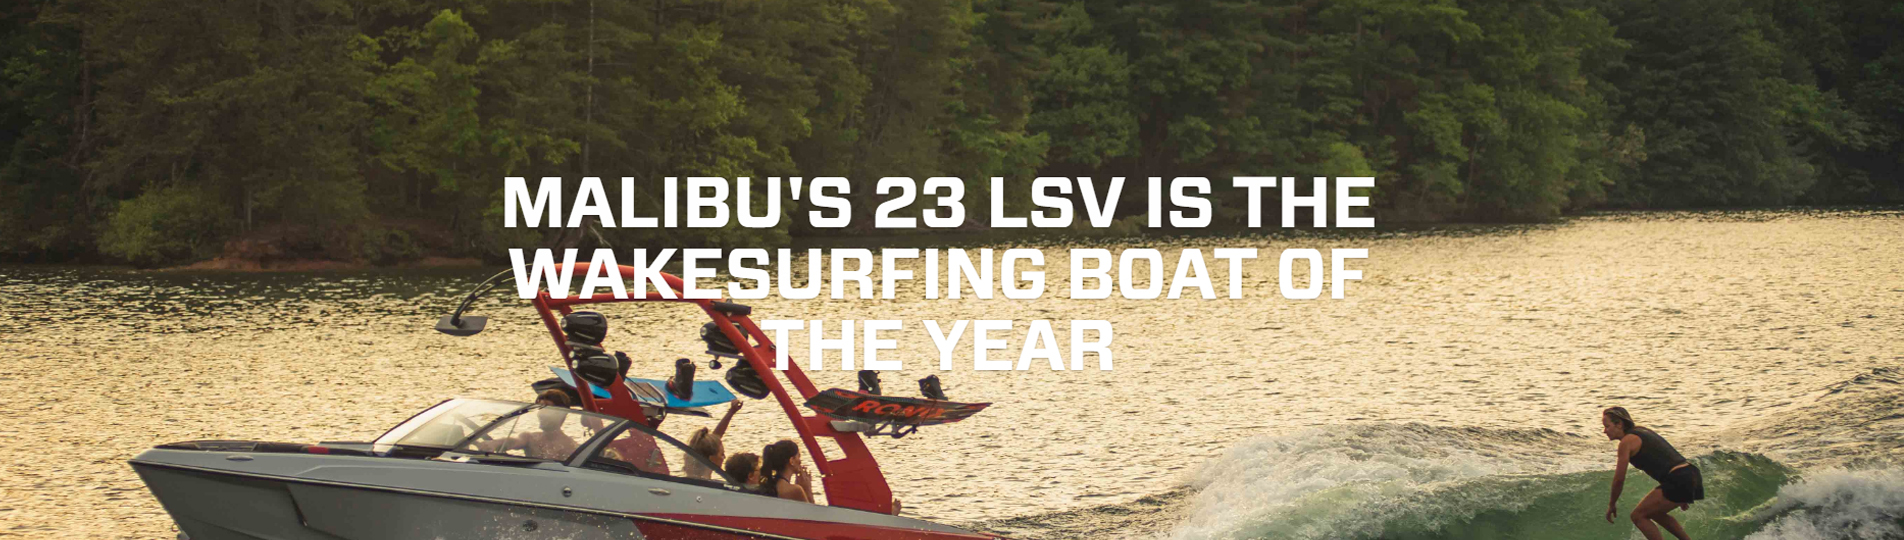 malibu-boat-year